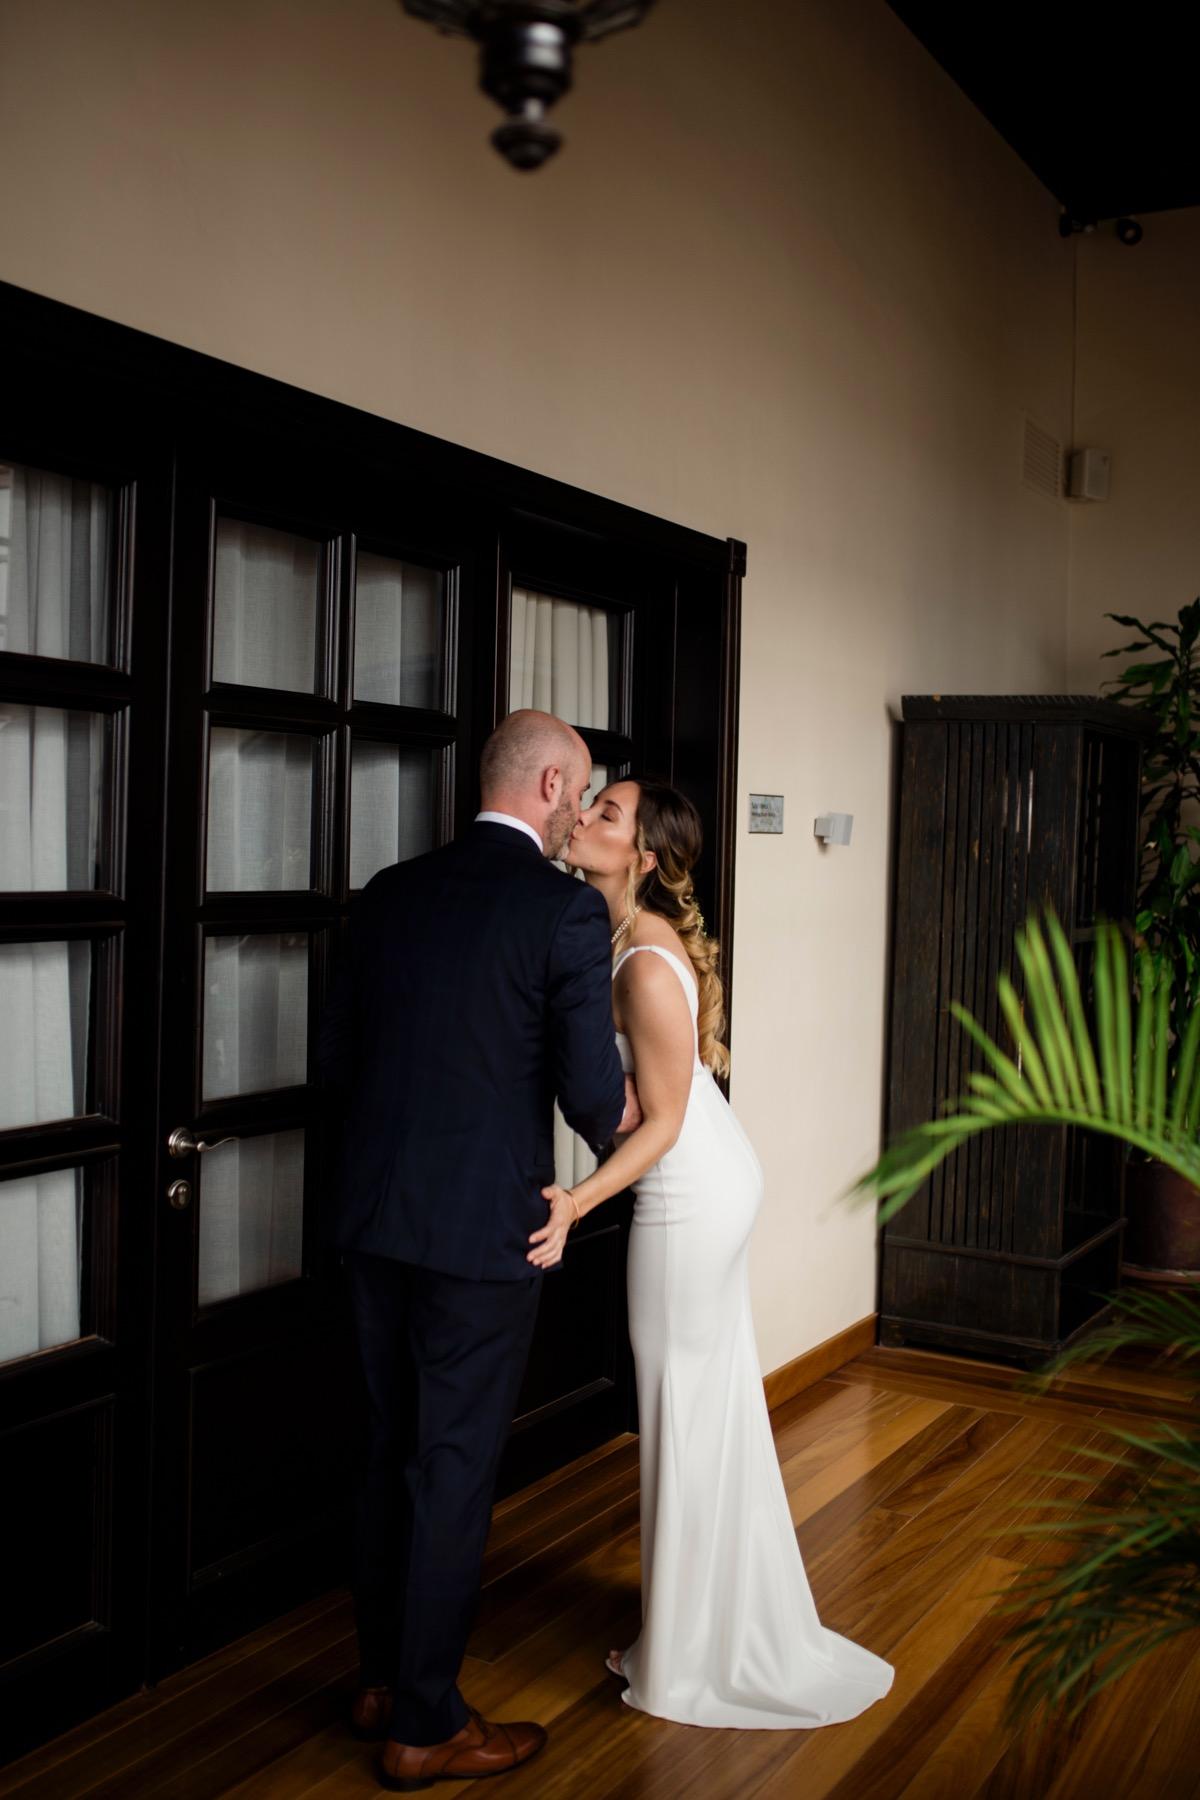 fotografo de bodas en Tenerife first look